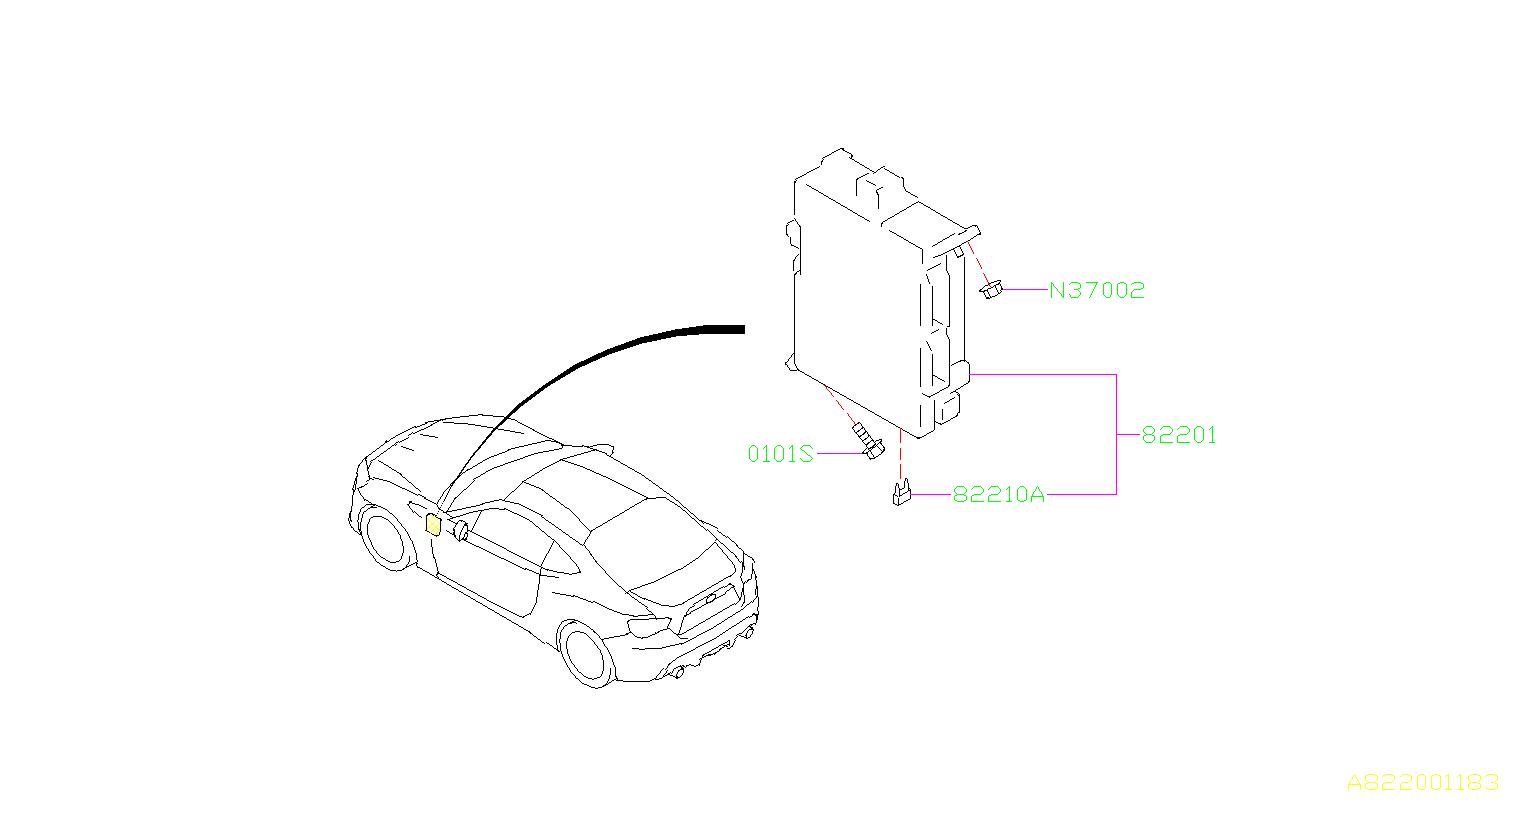 Subaru Brz Fuse-auto  Box  Harness  Wiring